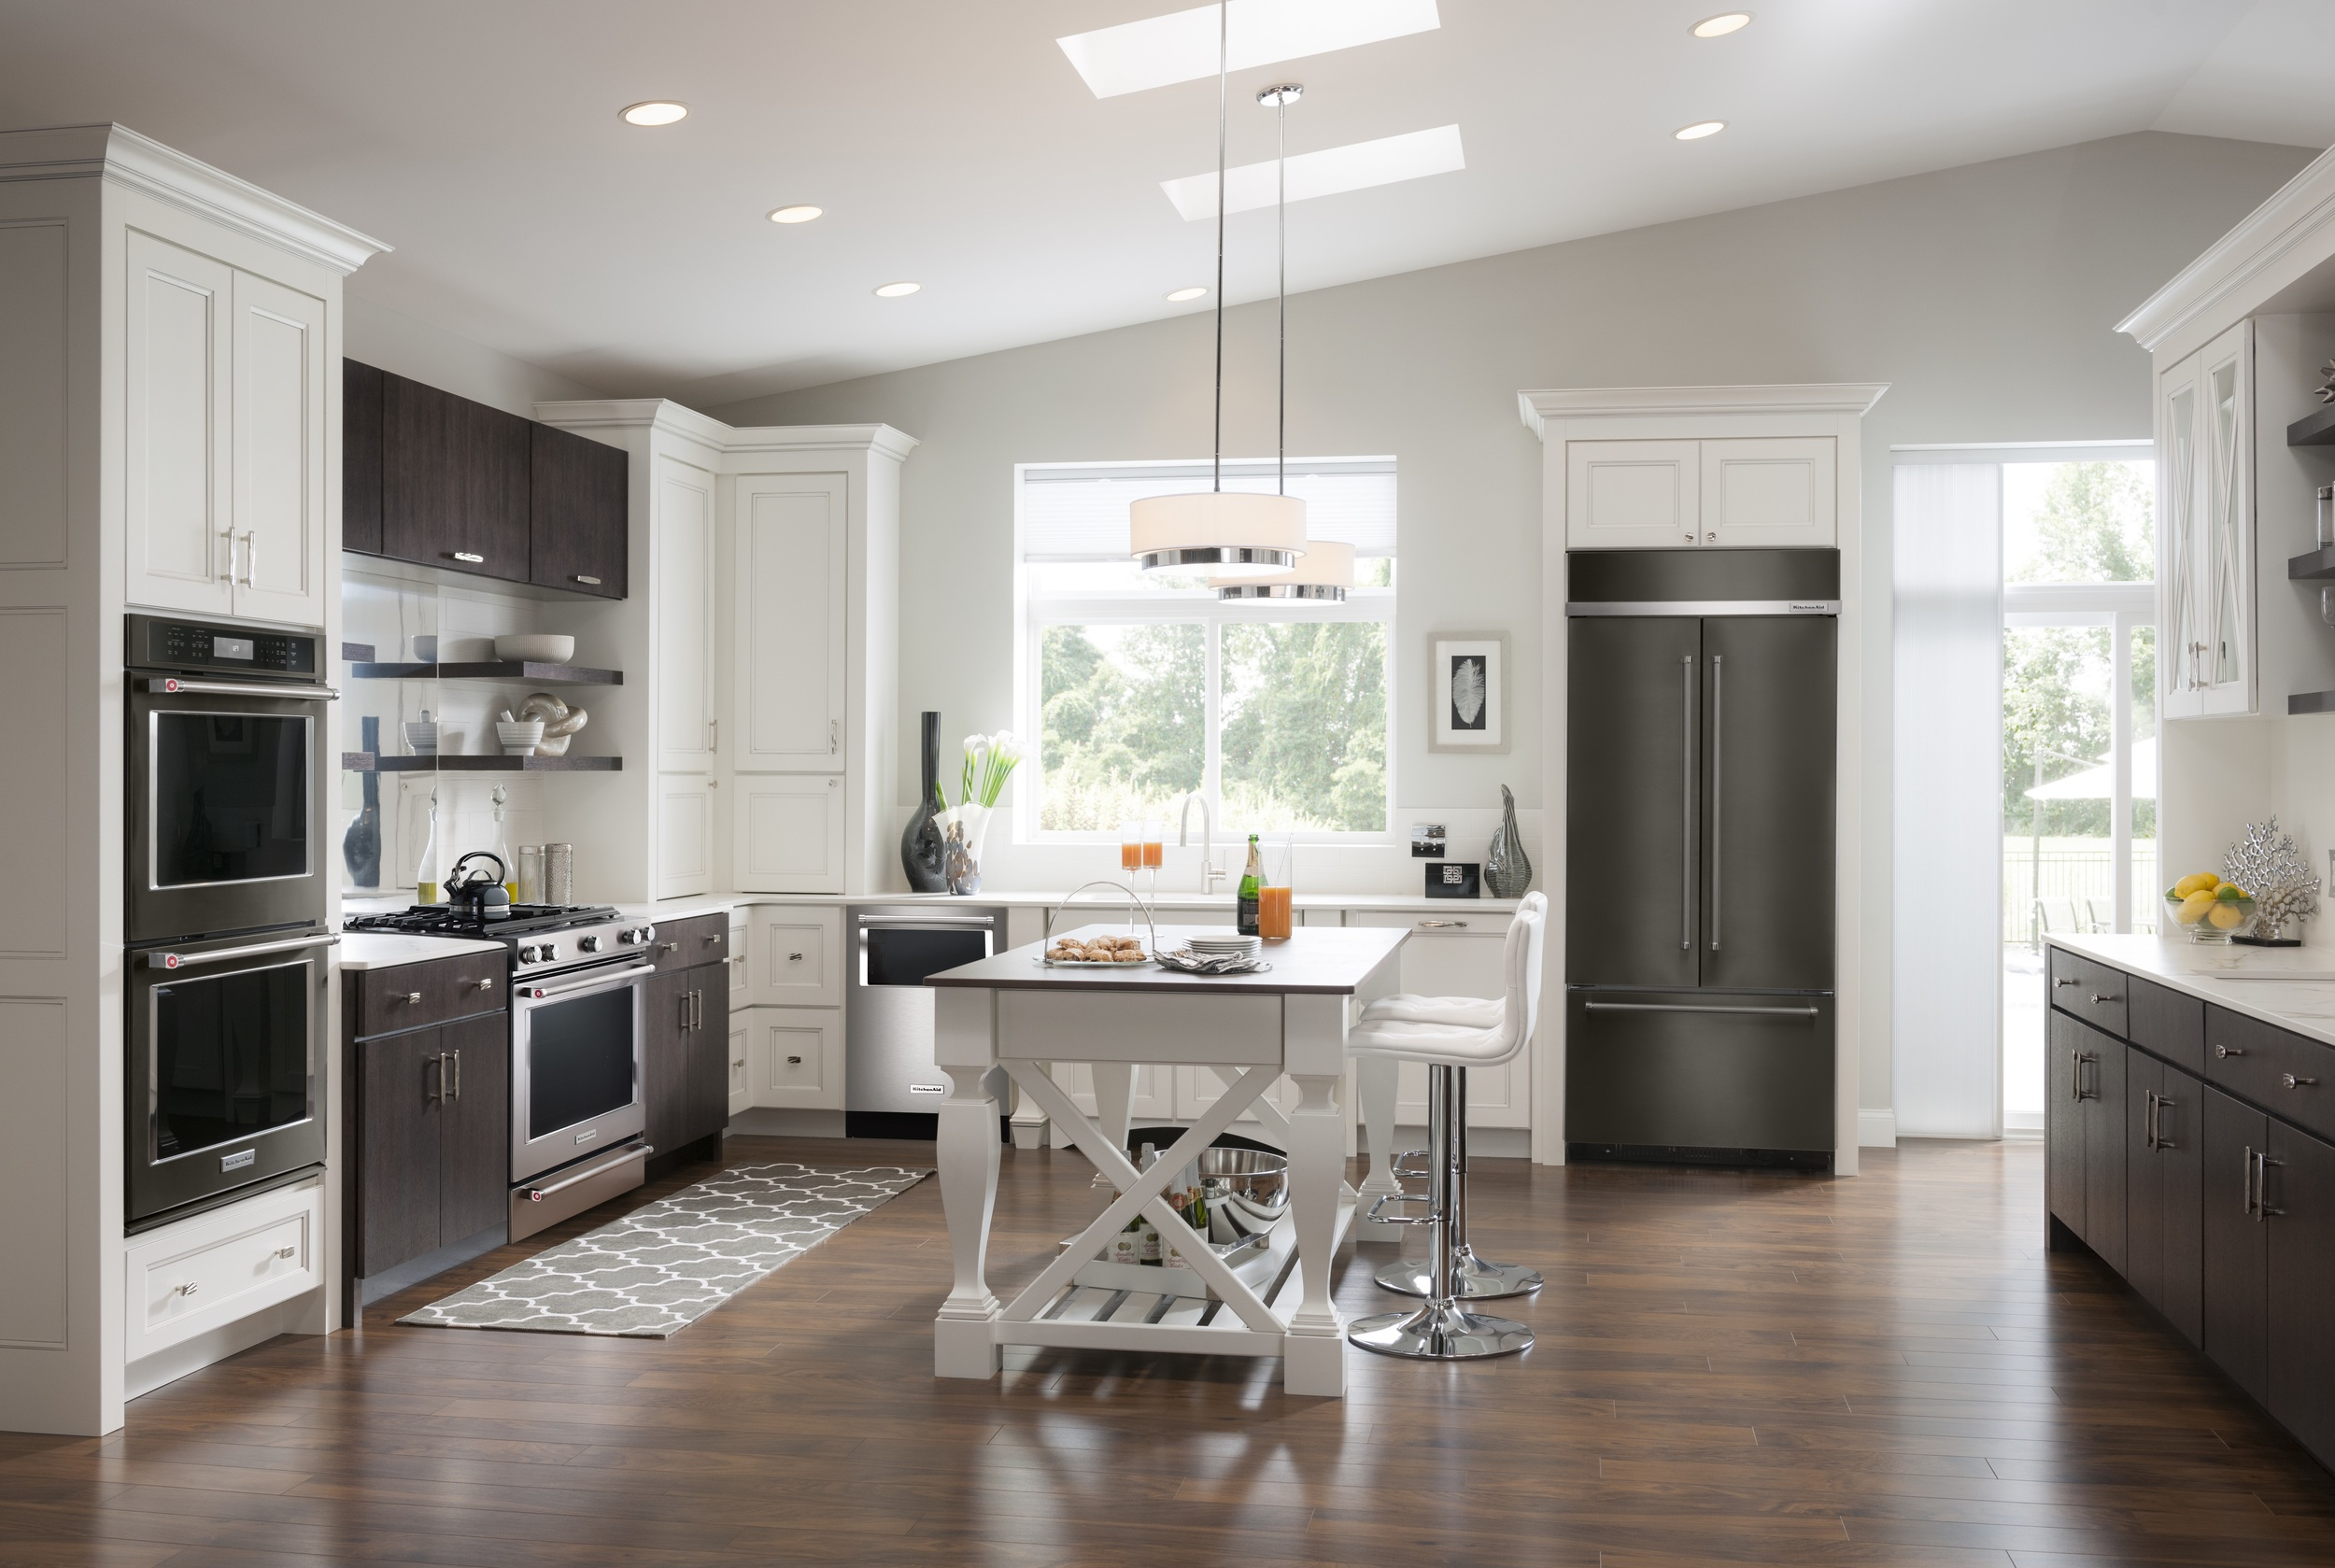 kitchenaid black stainless 7.jpg